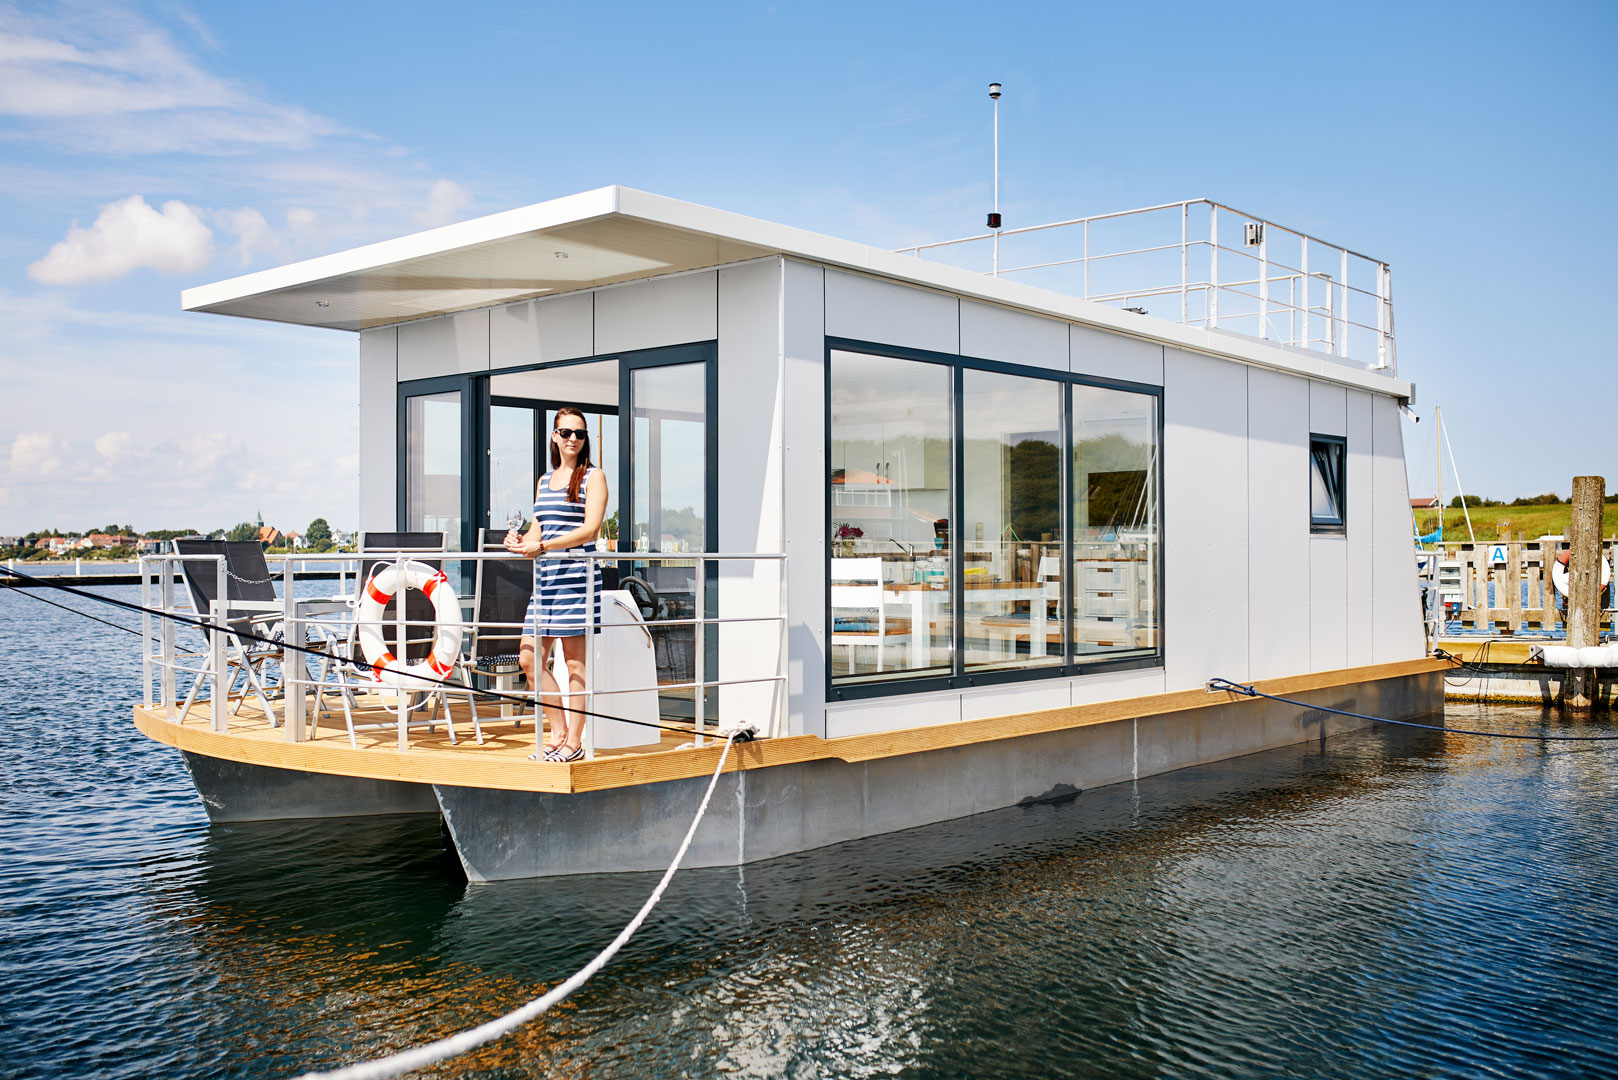 hausboot kaufen floating 30 liegepl tze an der ostsee. Black Bedroom Furniture Sets. Home Design Ideas